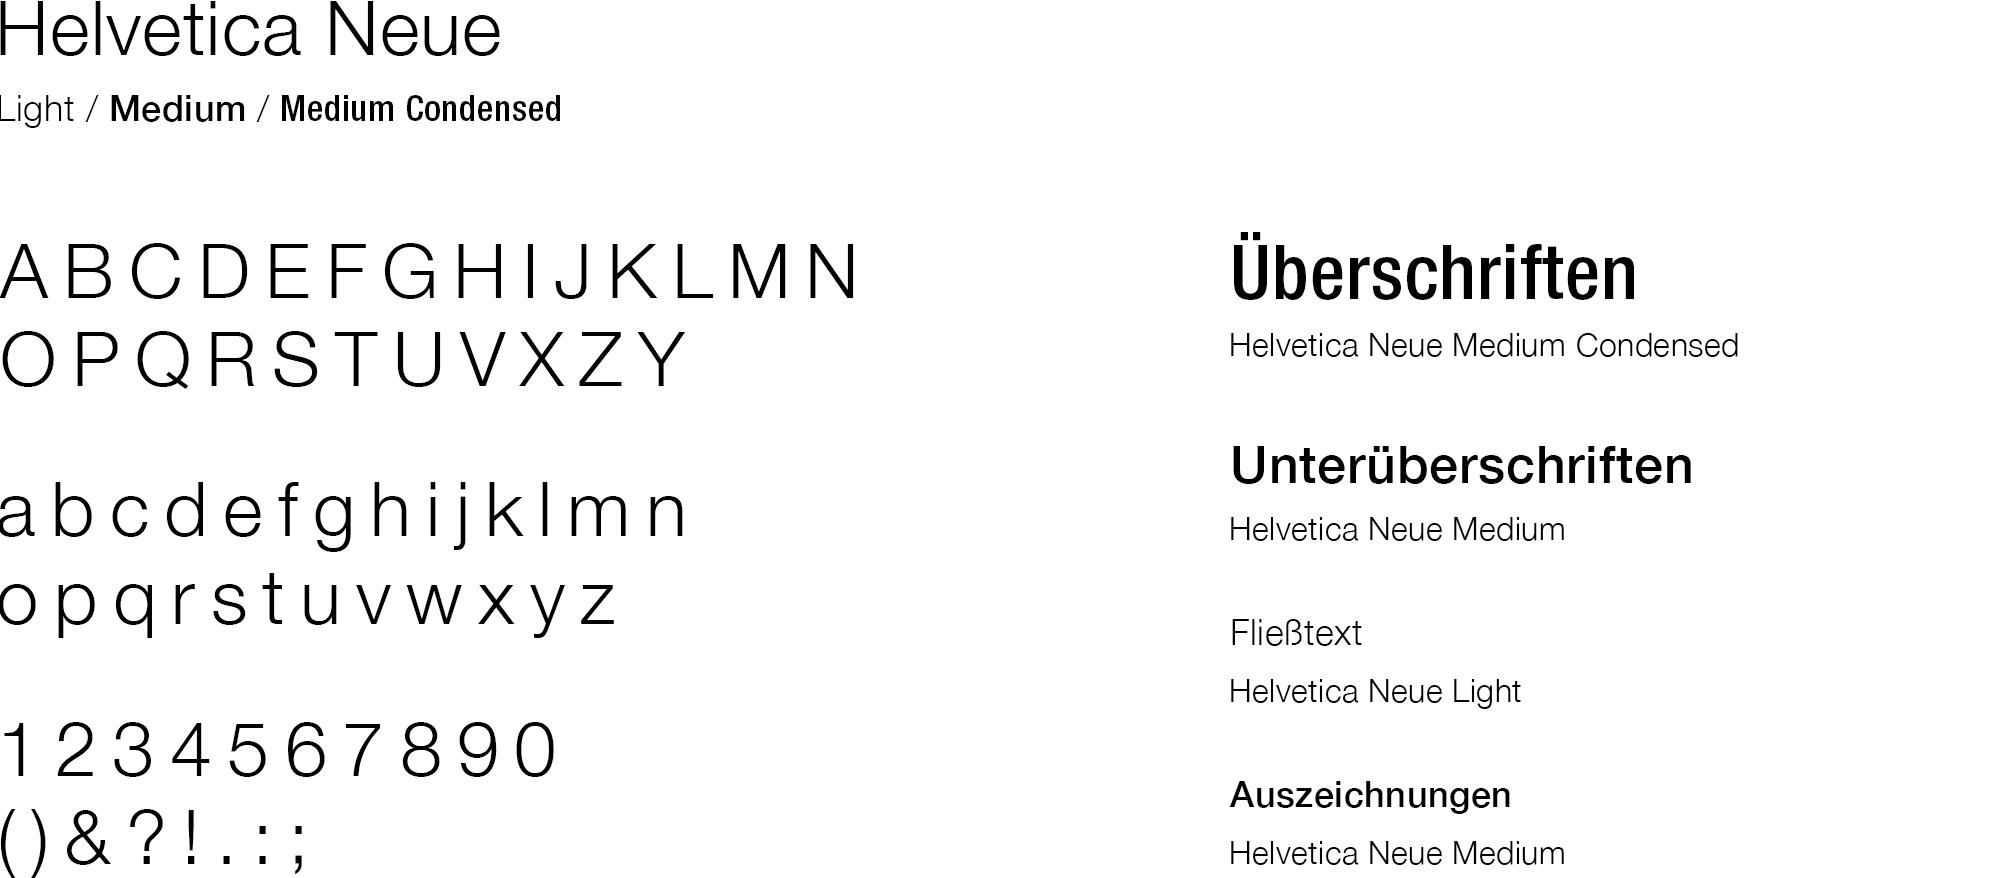 maxfath-ingenieurbuero-melanie-mayr-mering-branding-typografie